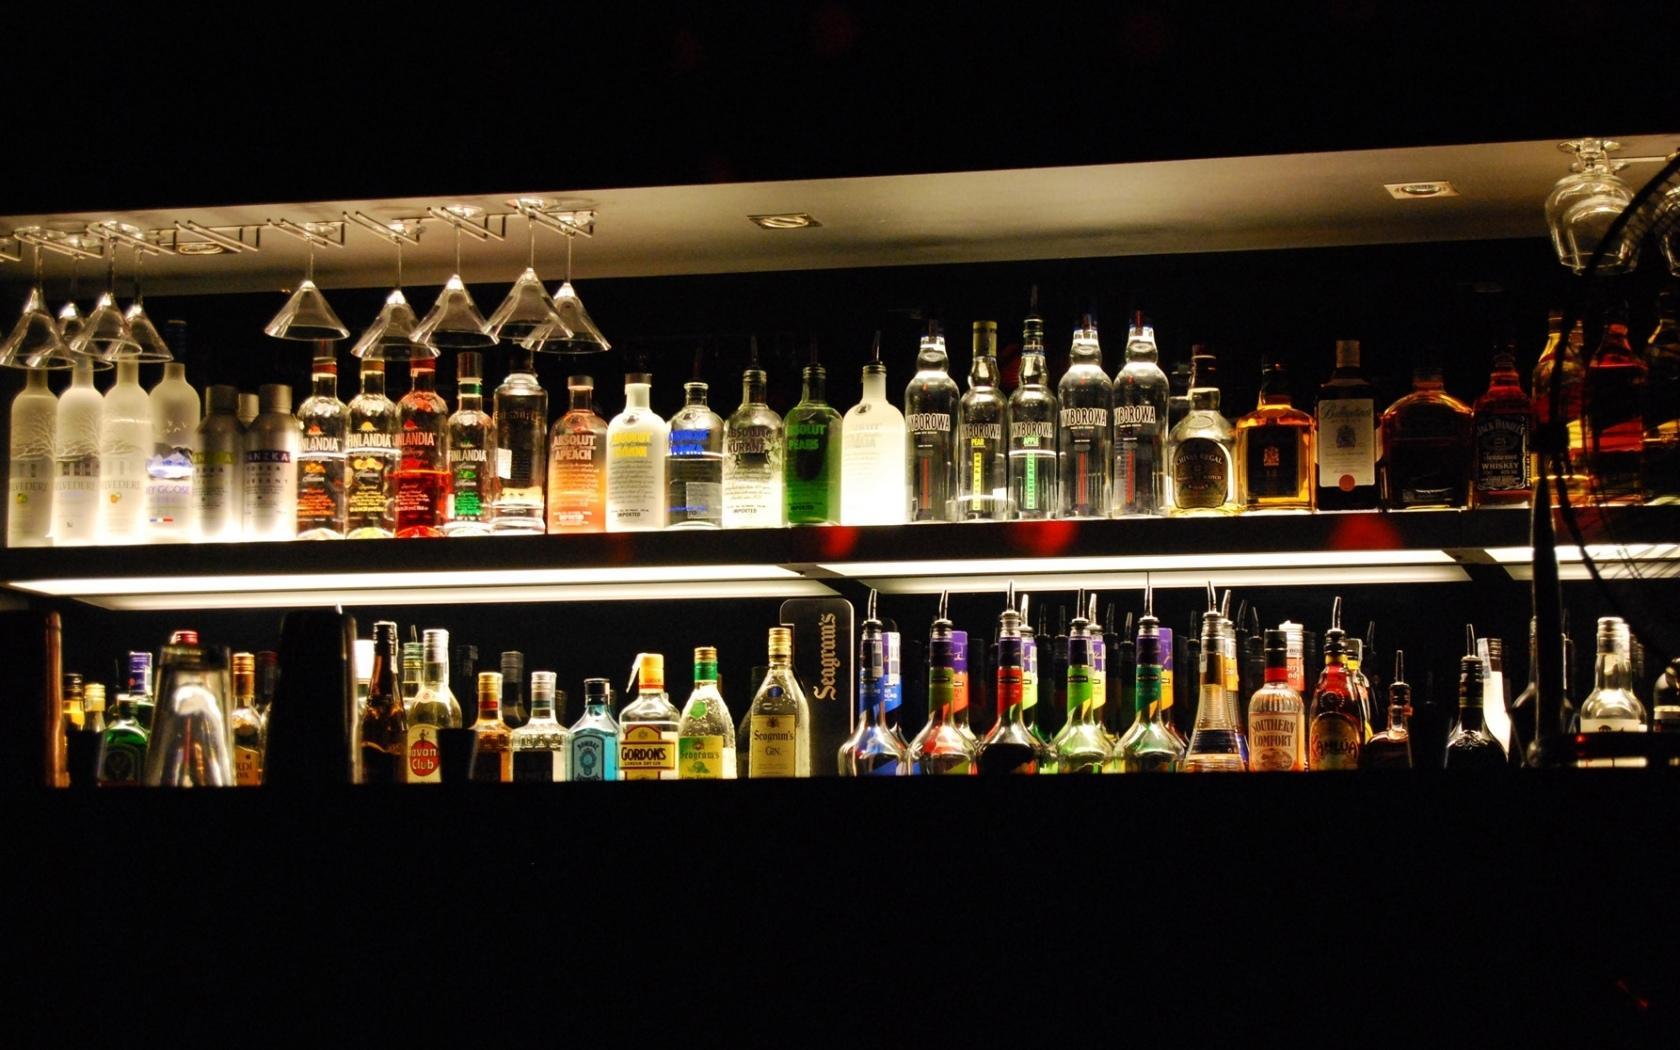 Liquor wallpapers HD quality